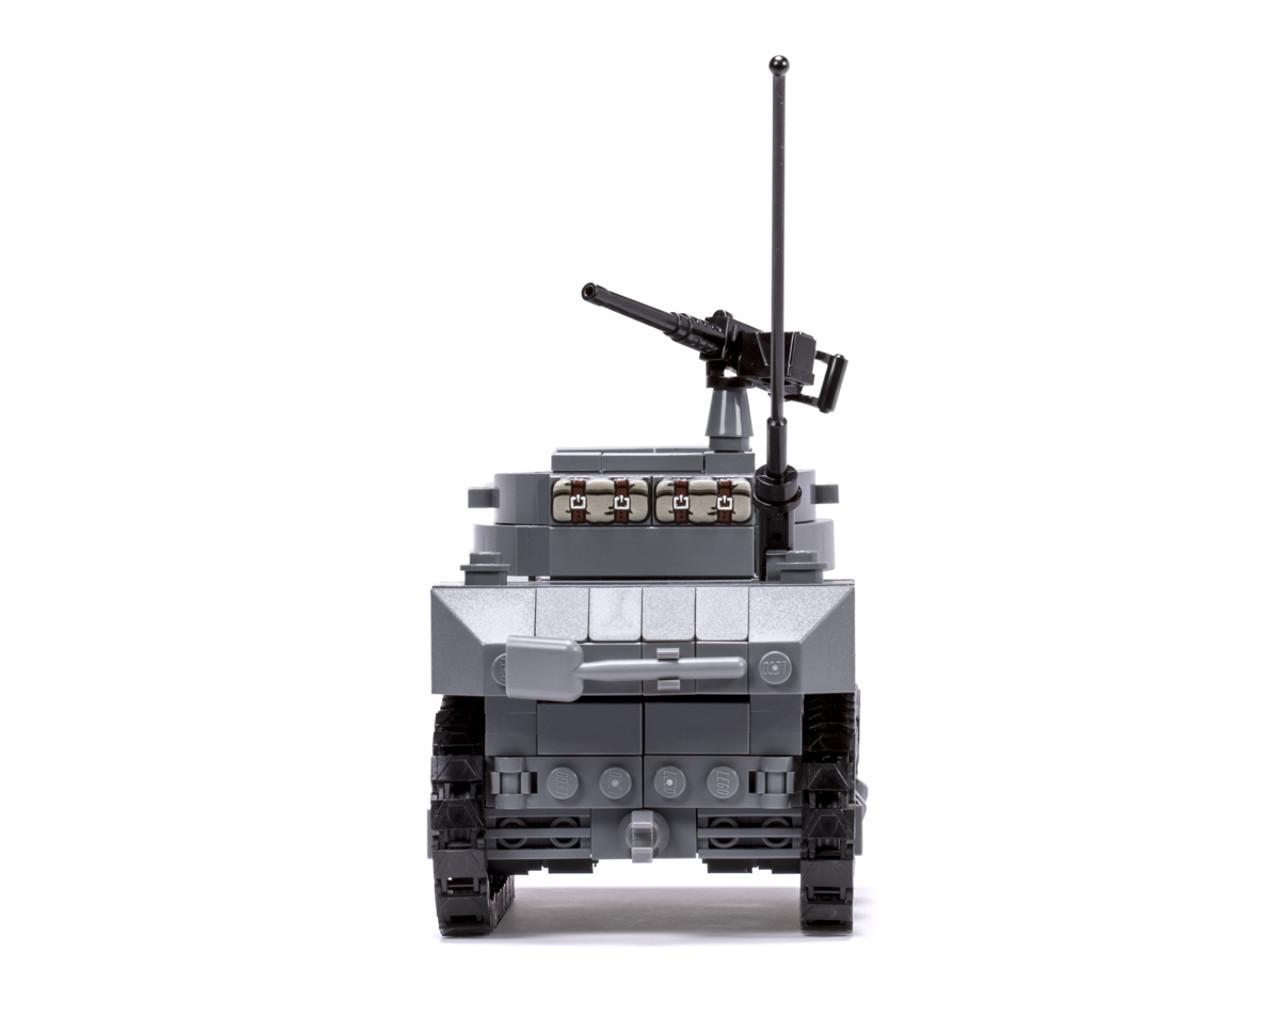 M8 Scott - 75mm Howitzer Motor Carriage